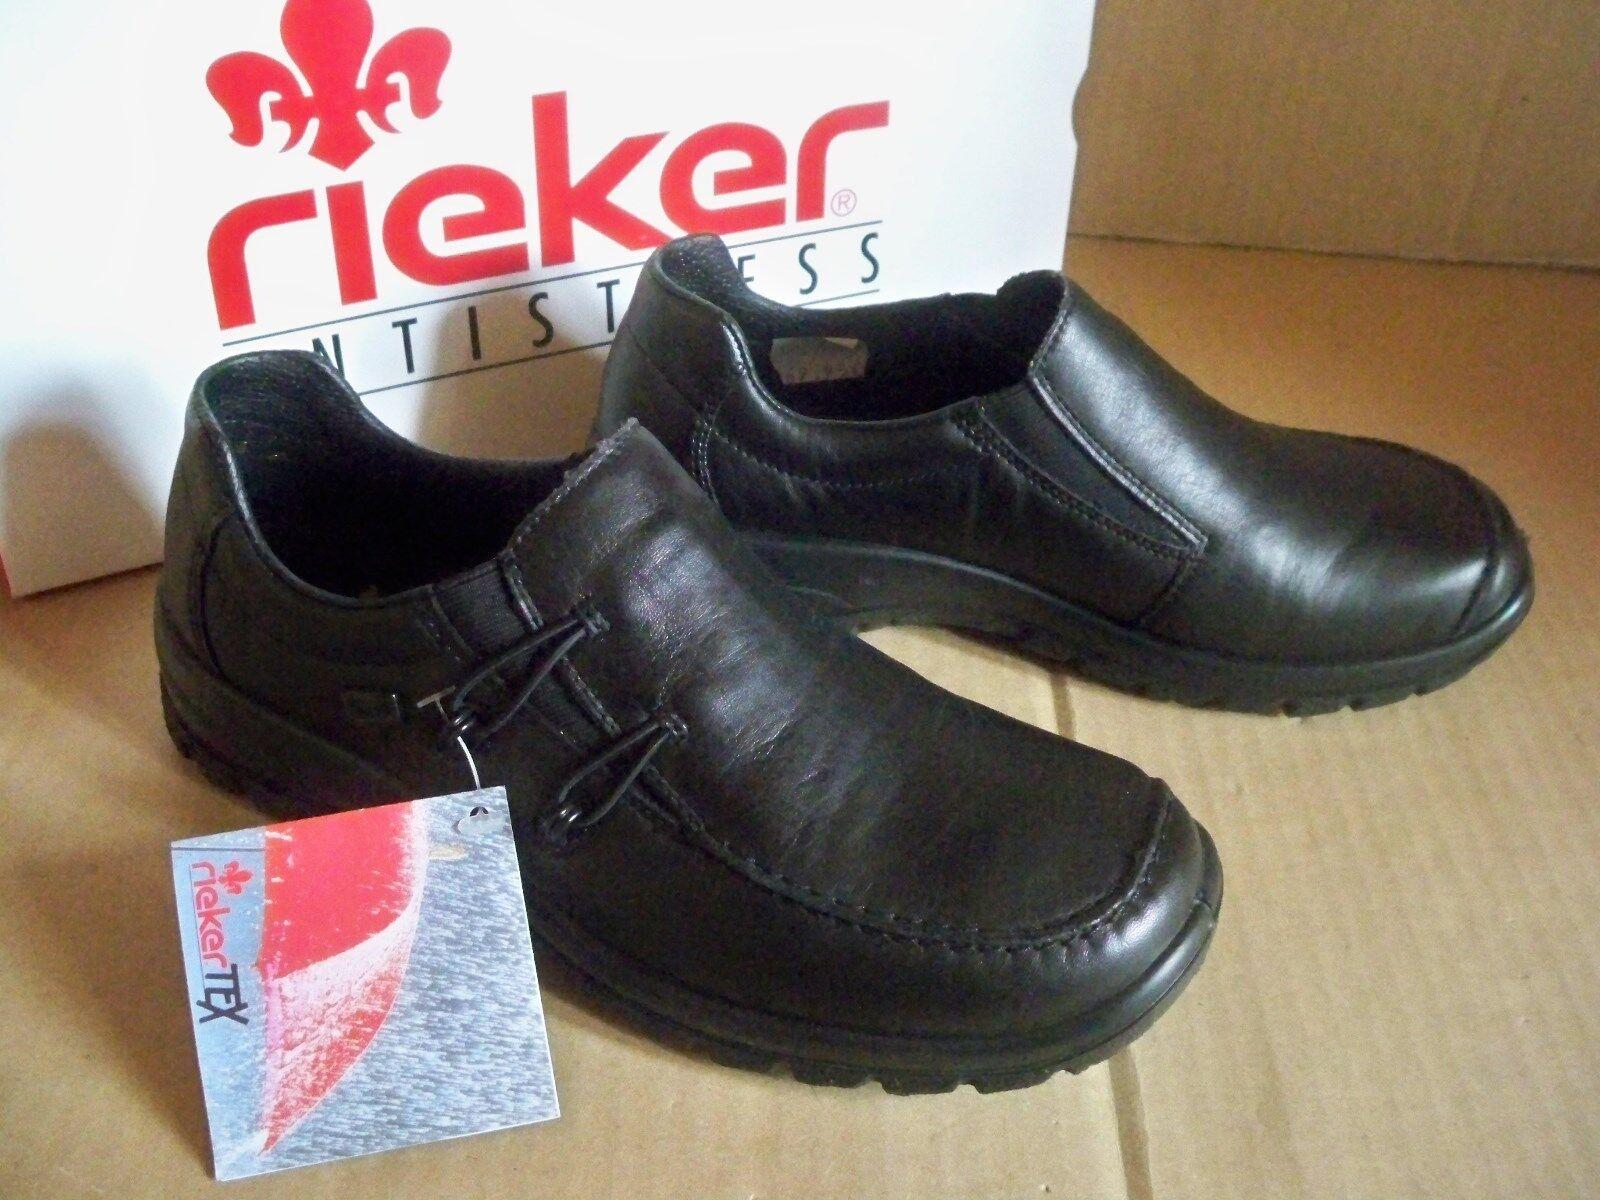 Rieker ANTISTRESS Damen Slipper schwarz riekerTex Membran Leder L7180-01